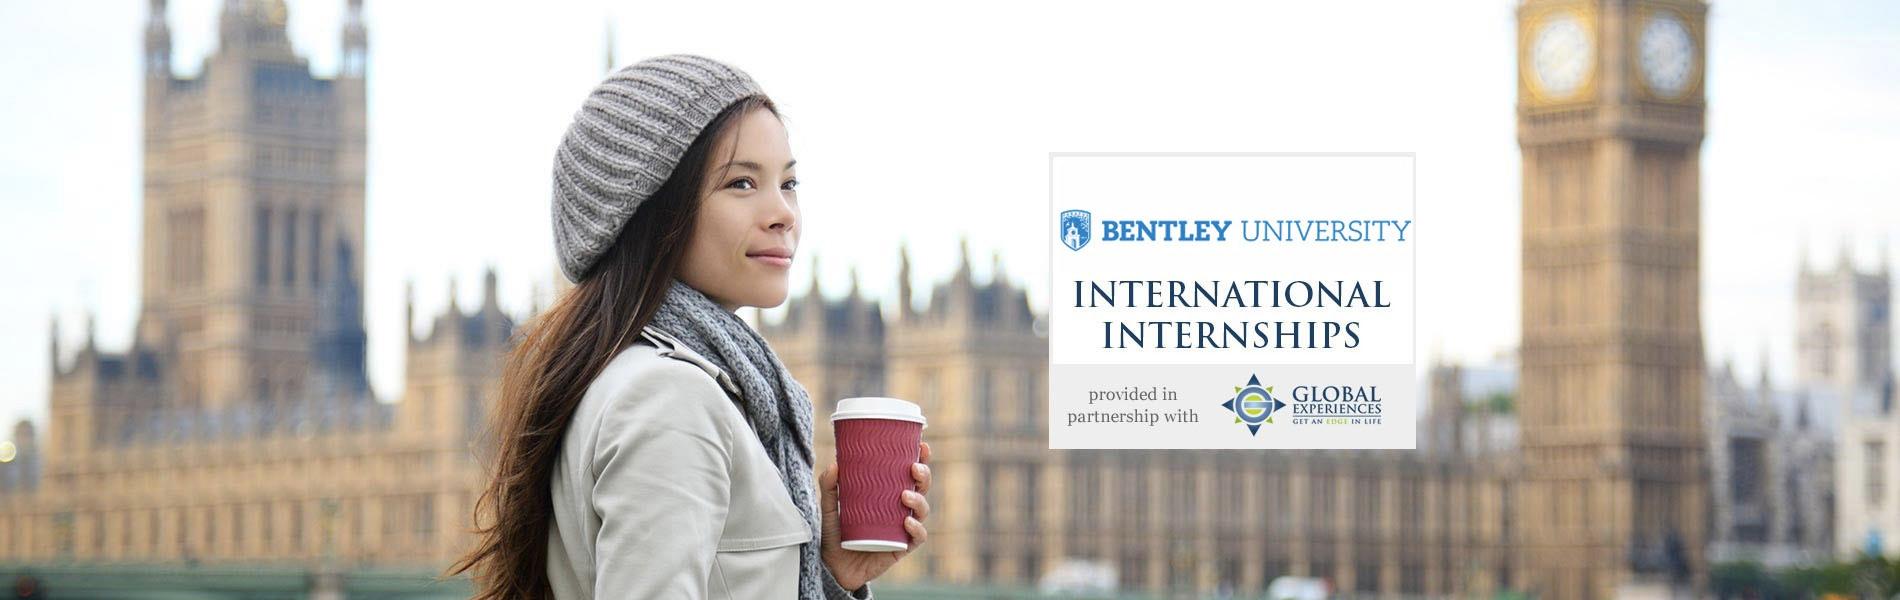 Bentley University Intern Abroad